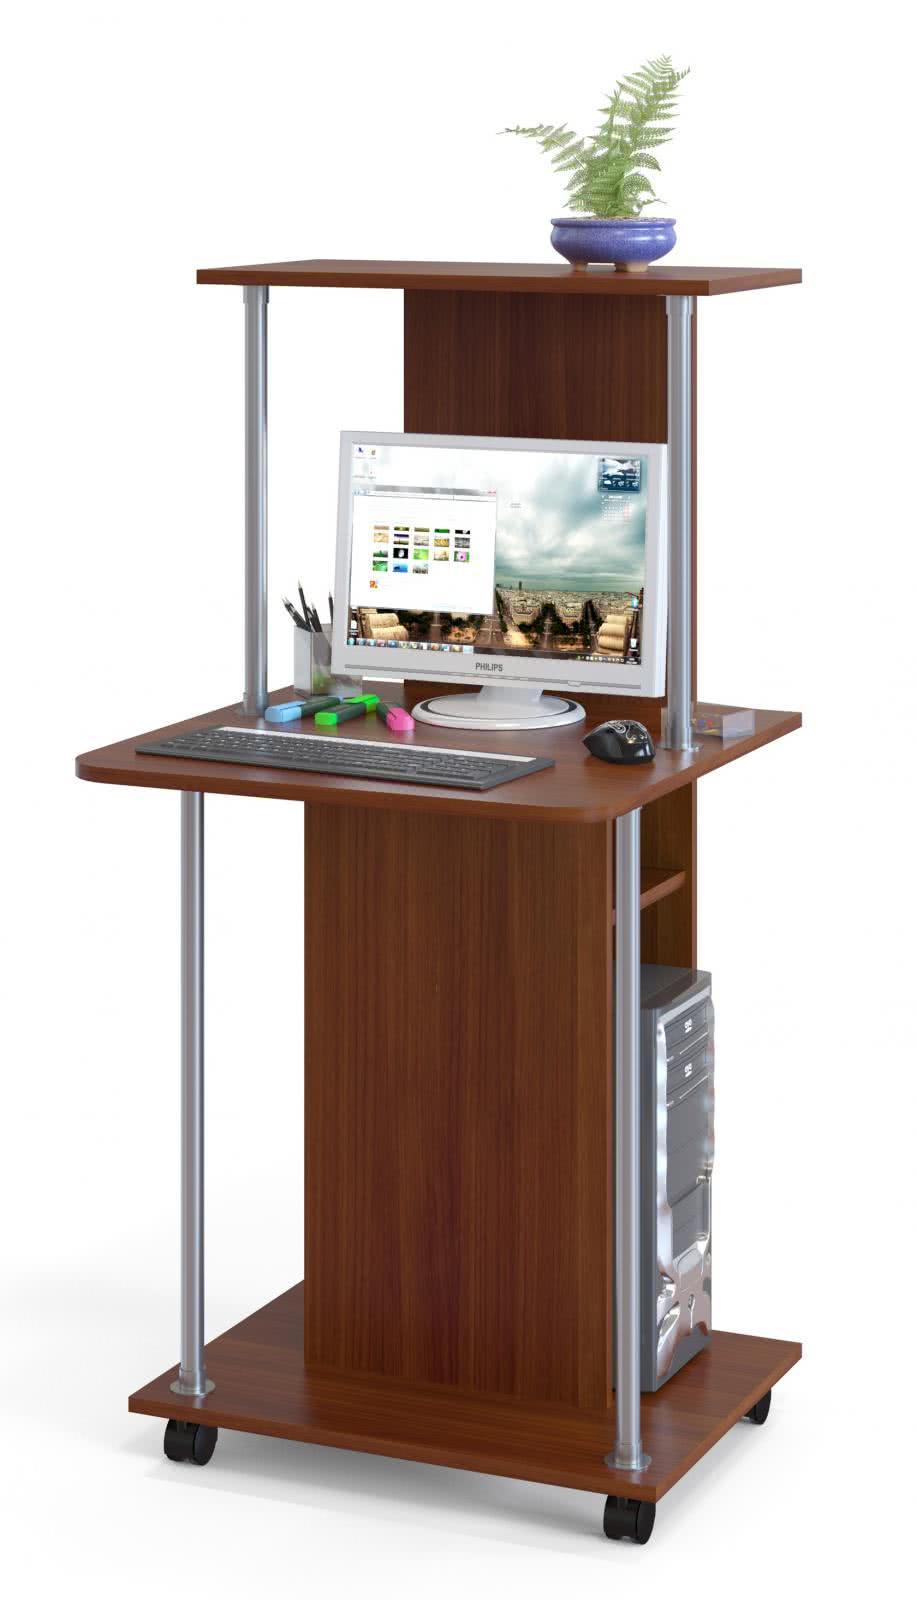 Стол компьютерный Сокол КСТ-12